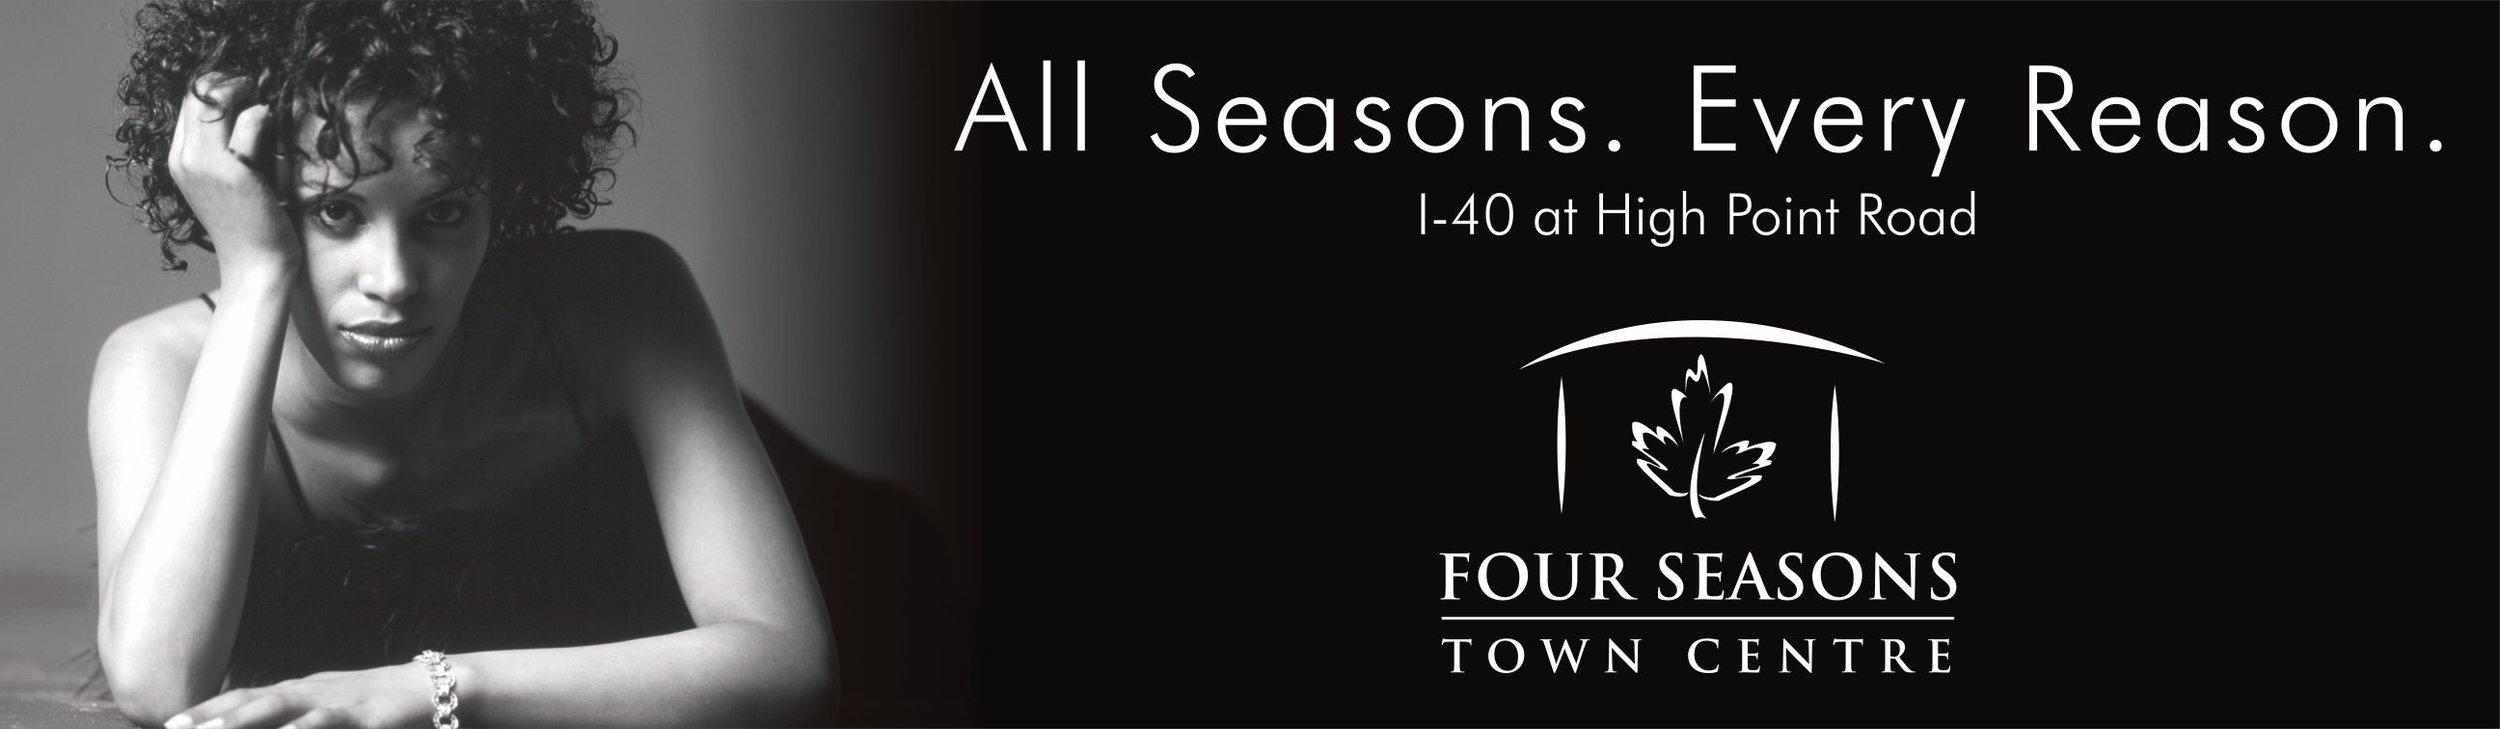 Billboard | Four Season Branding Design by Cybergraph